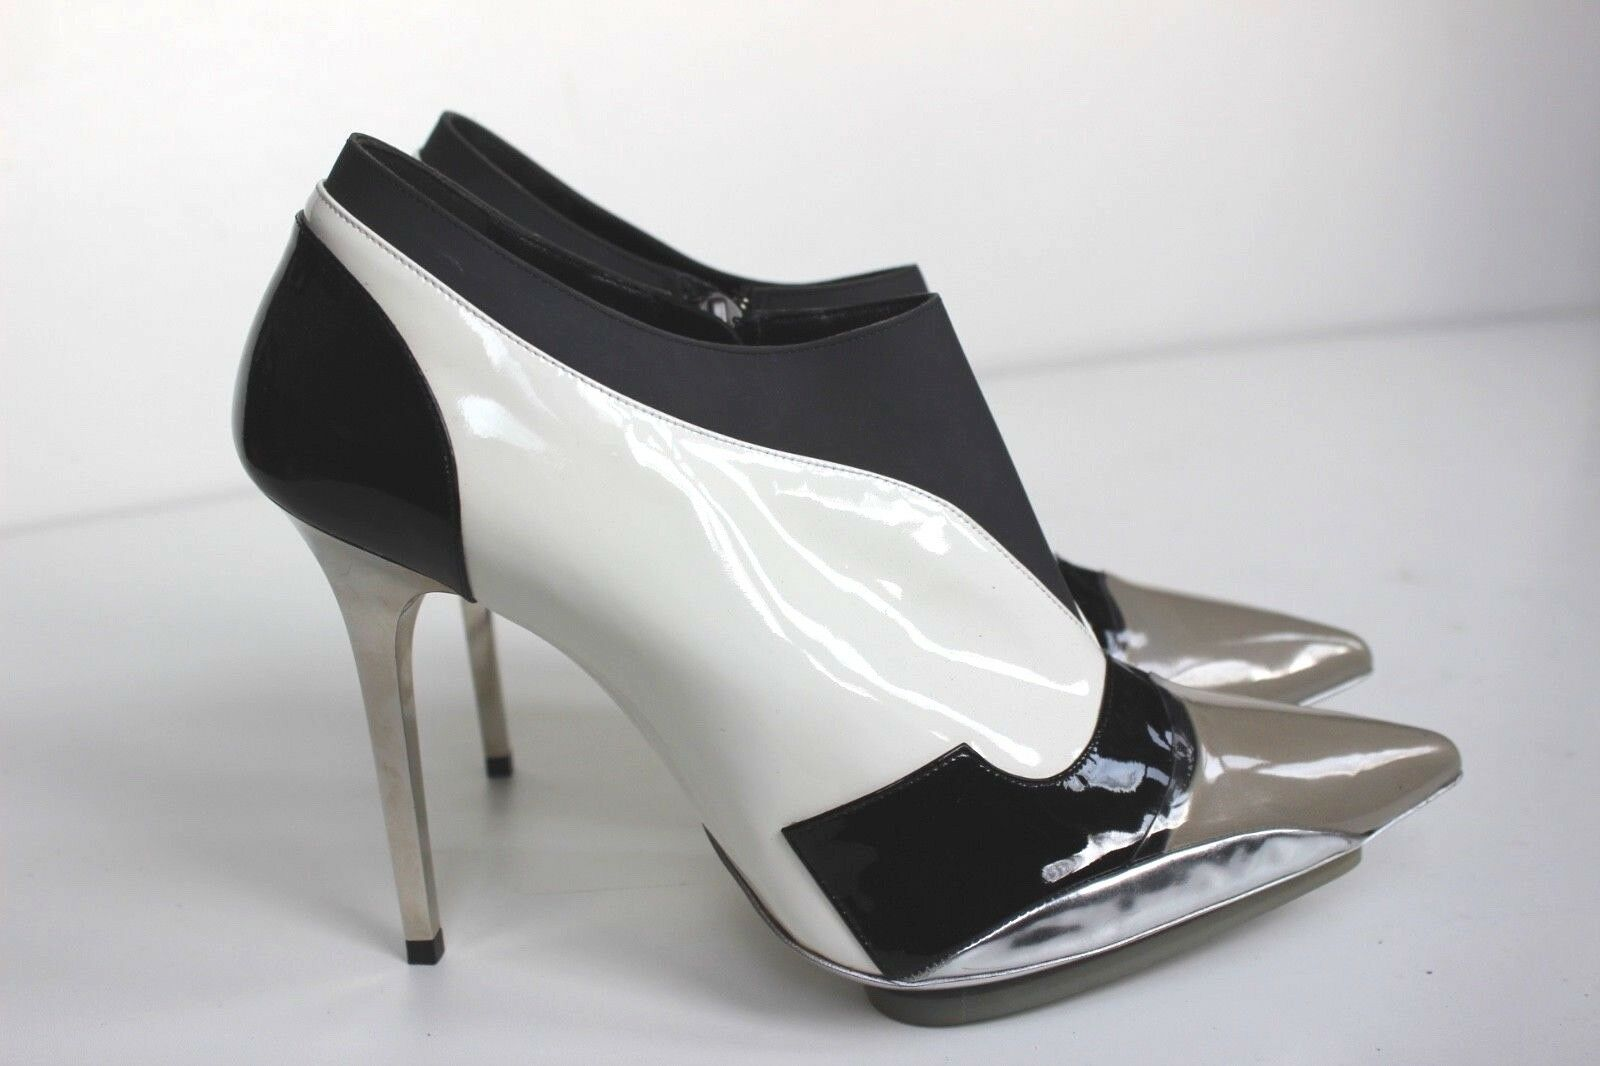 BALENCIAGA FW2008 Nicolas Ghesquière Silber grau Pointy Ankle Stiefel 40 uk 7